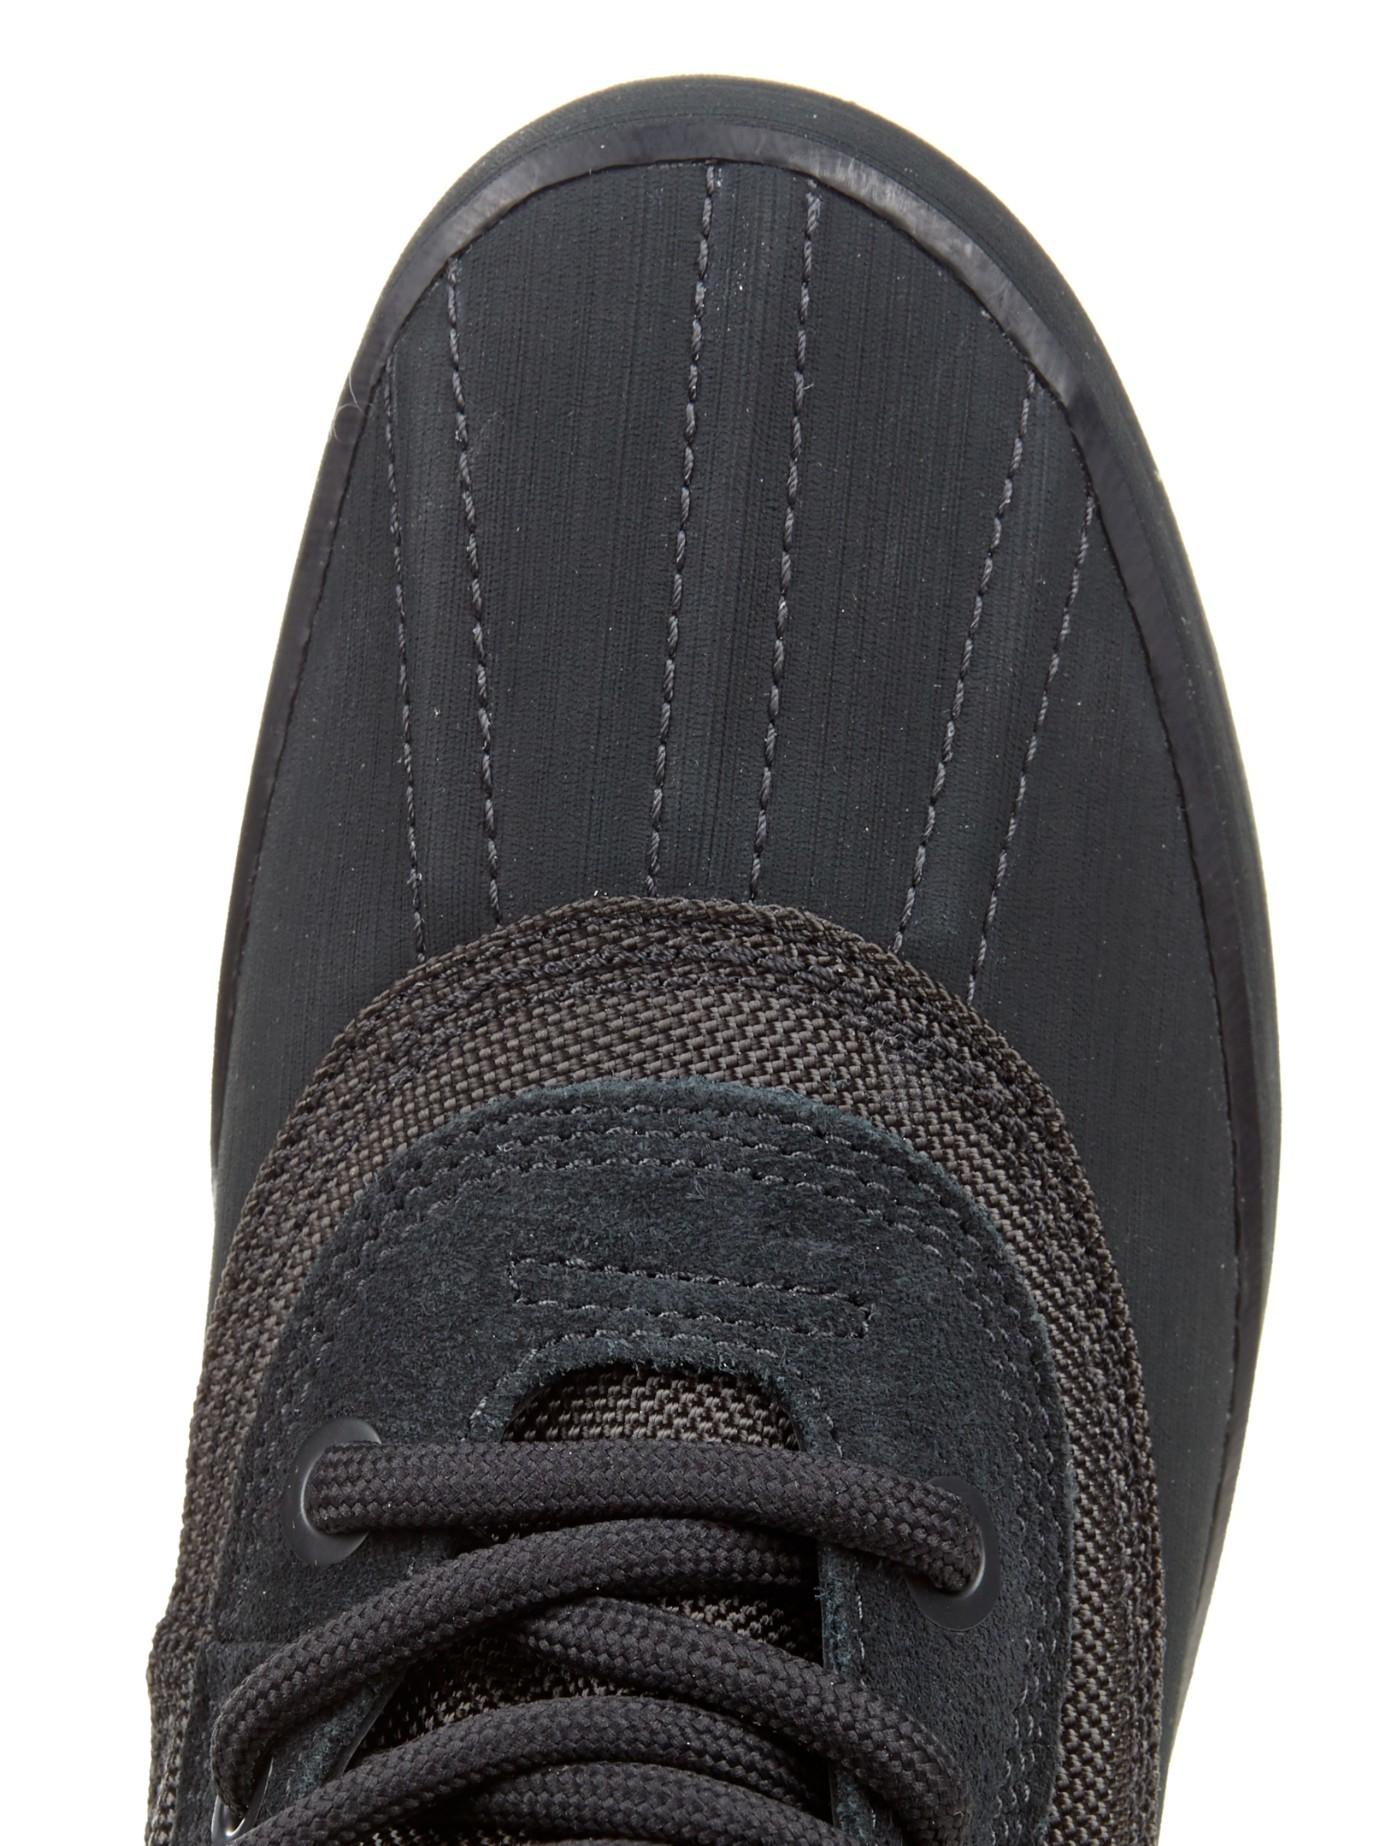 44d4e3922ba81 Lyst - Yeezy 950 Boots in Gray